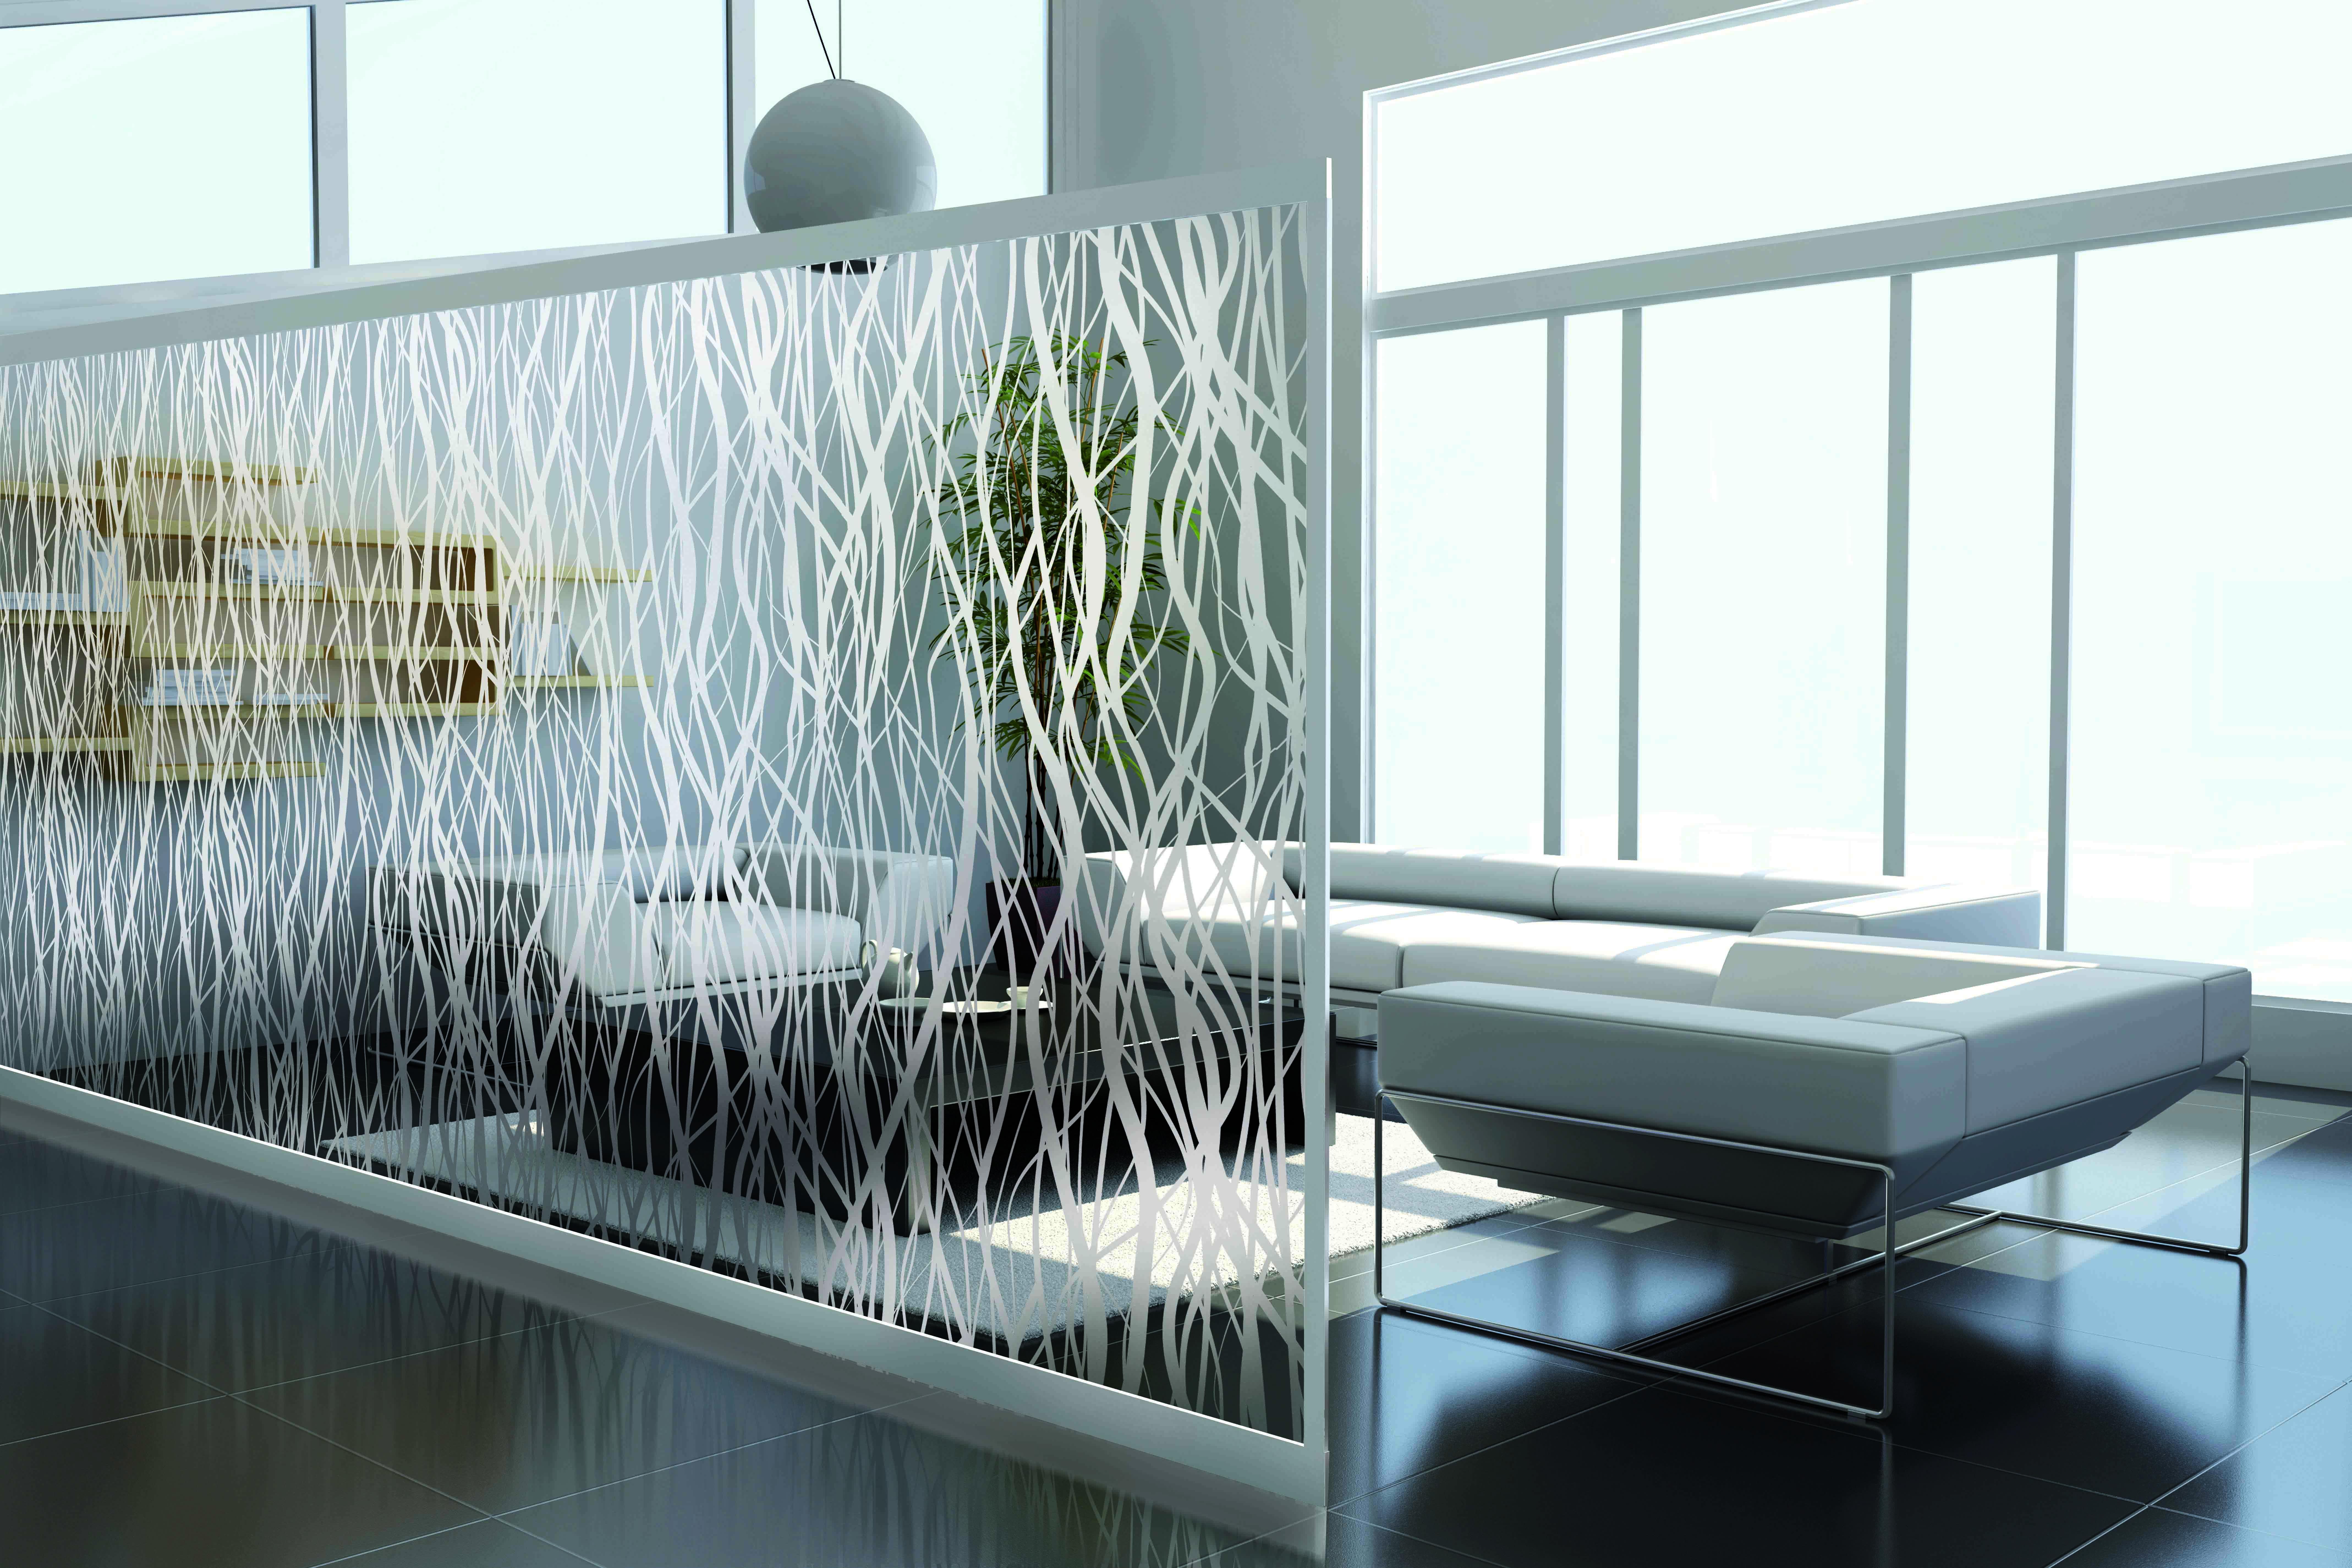 R flectiv adhesivos decorativos para vidrio escaparate - Partyraum einrichten ...